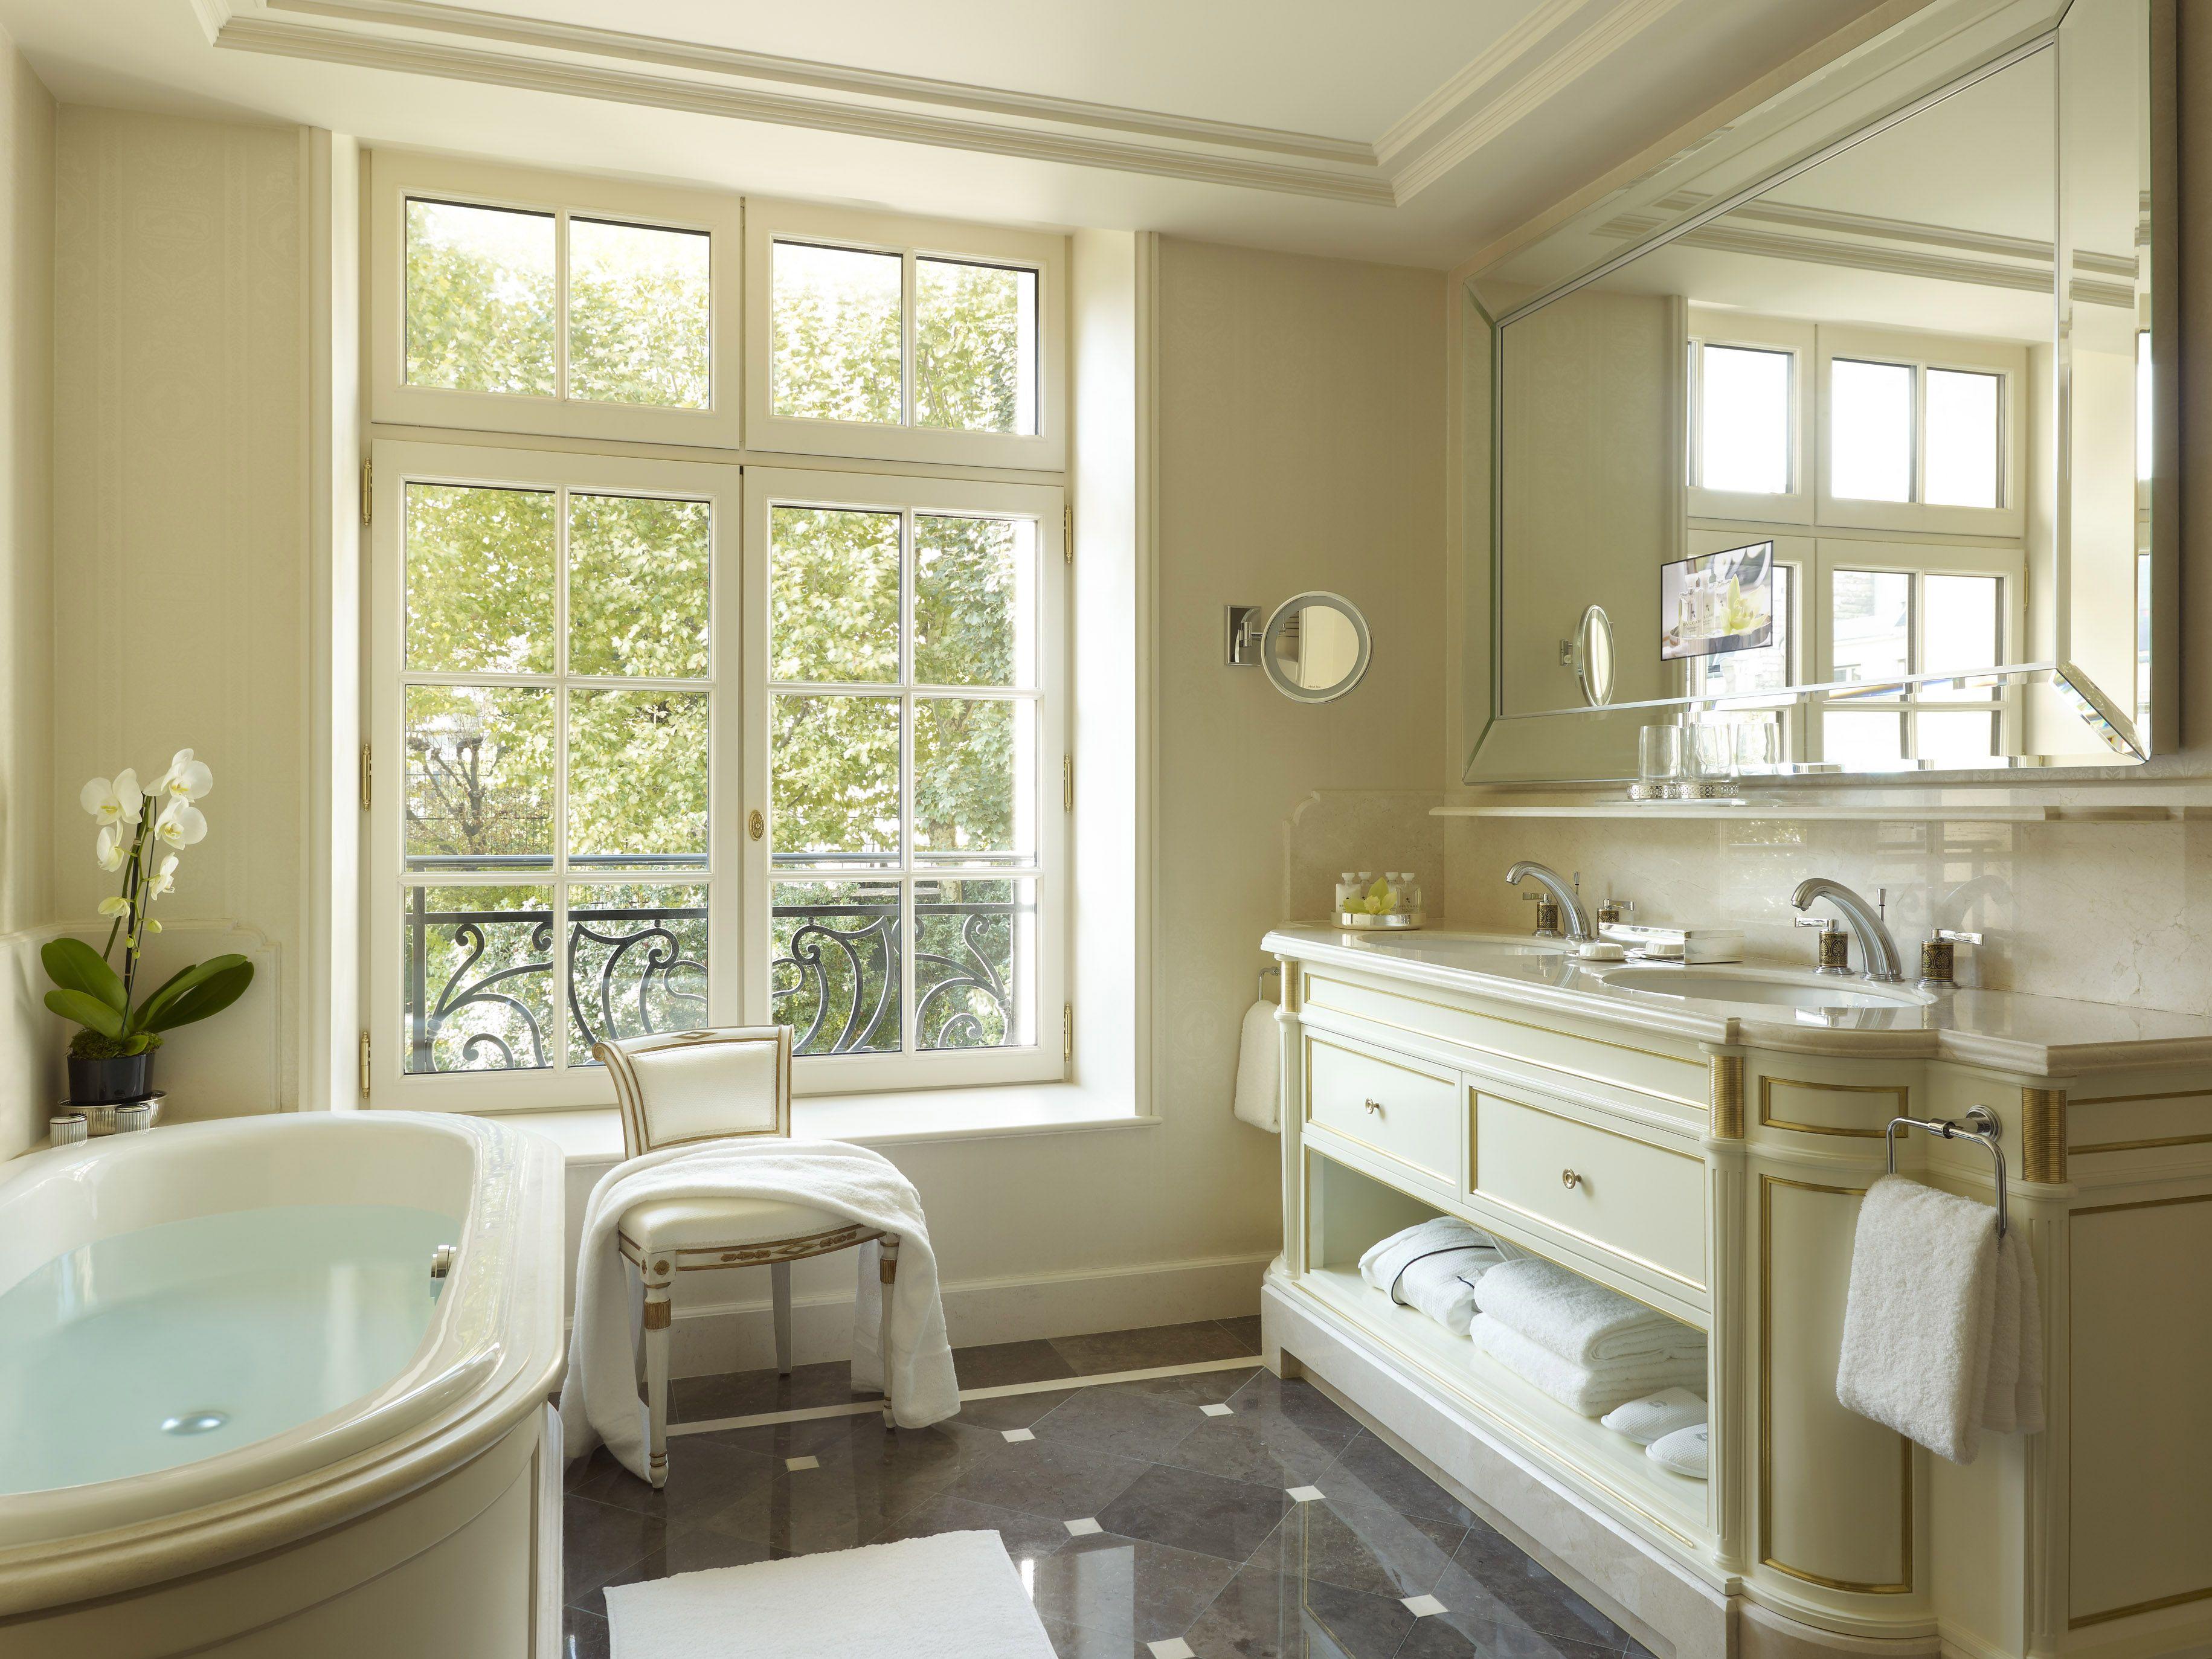 Why The Shangrila Is The Best Luxury Hotel In Paris  Shangri La Stunning Luxury Hotel Bathroom Review